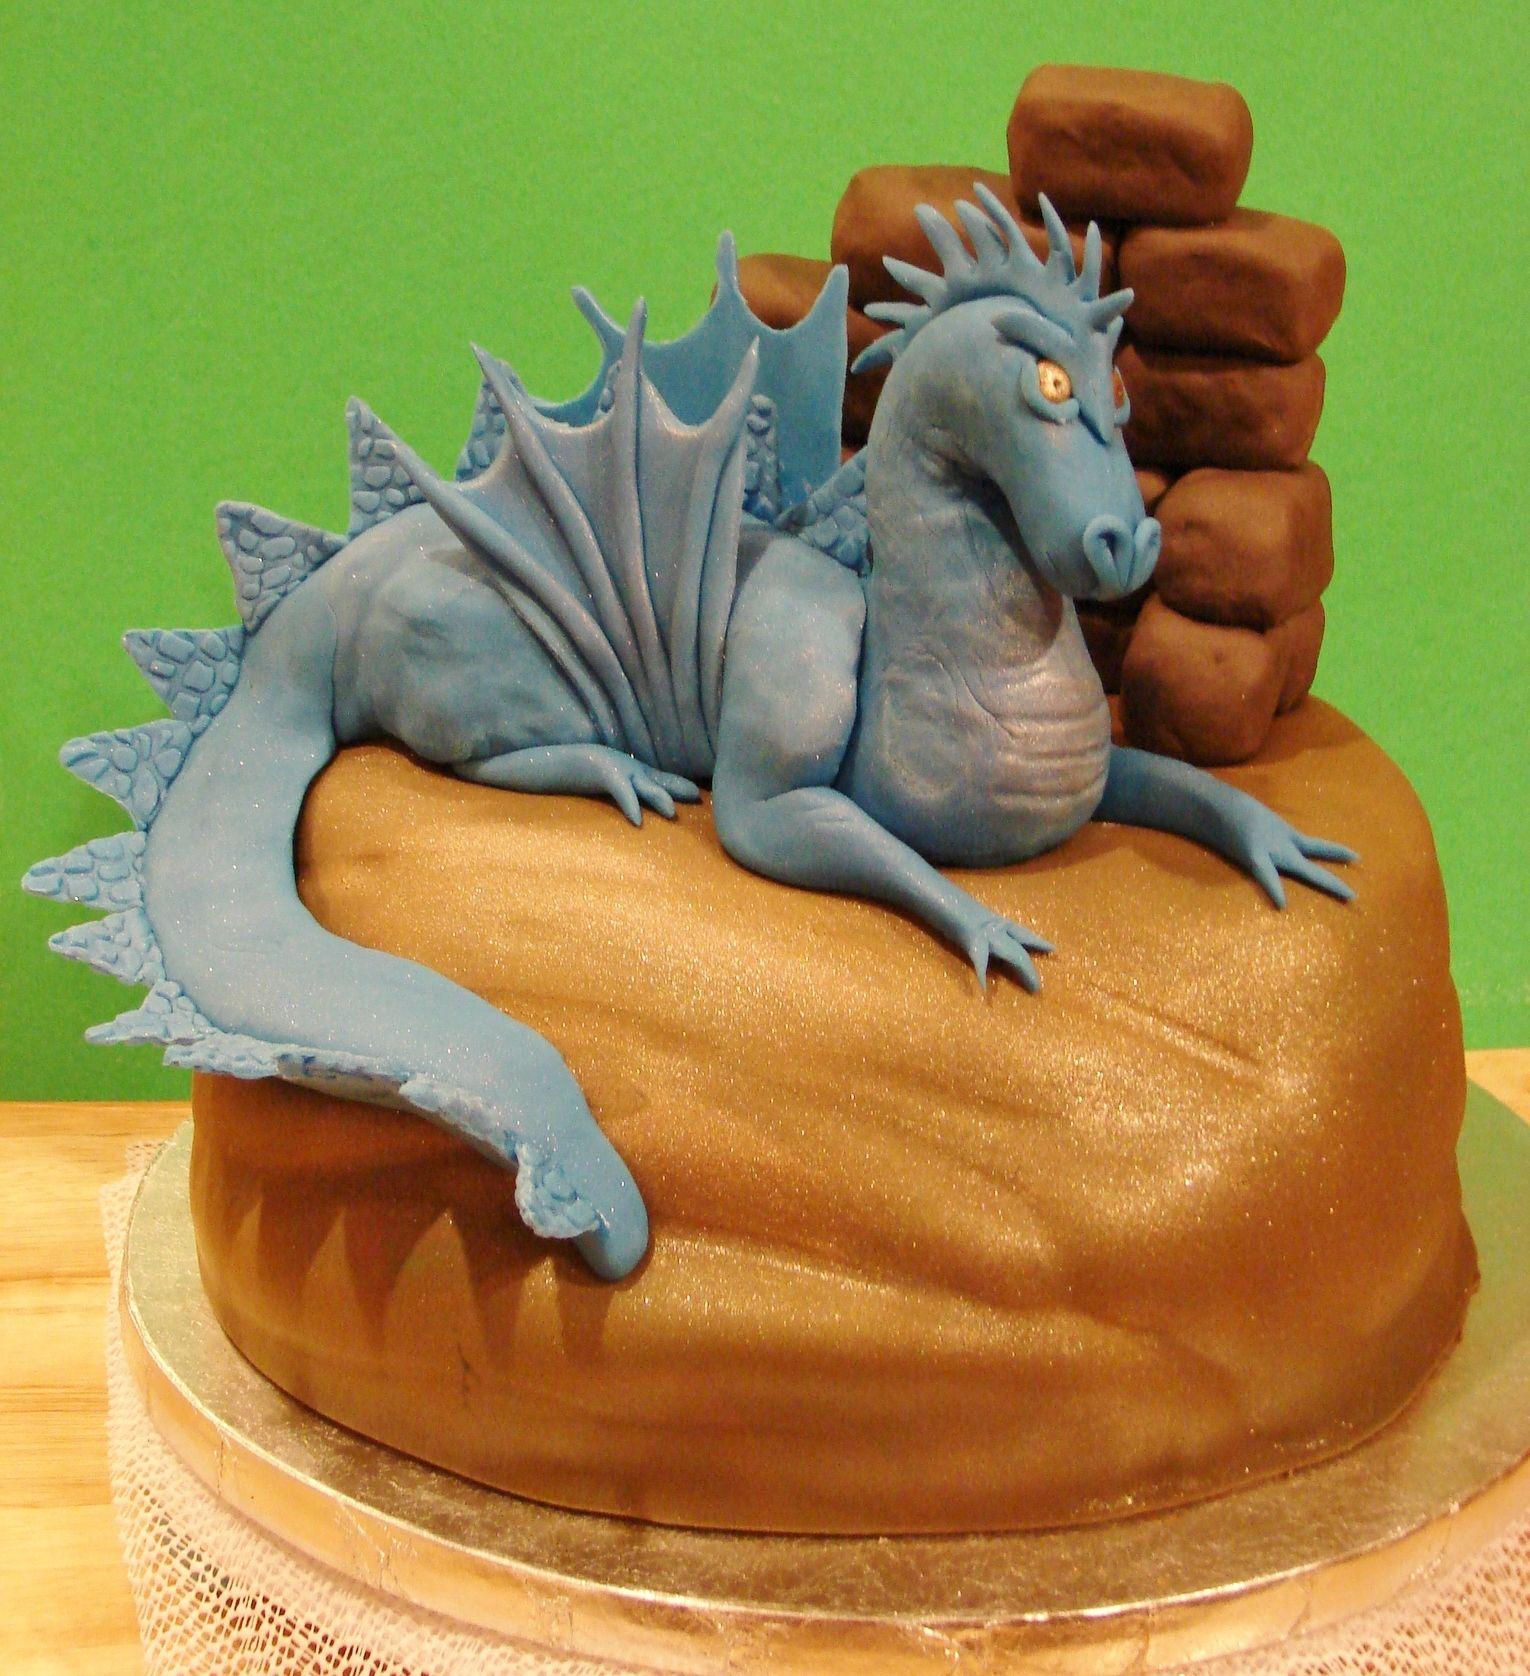 Marvelous Fierce Dragon Cake With Images Dragon Birthday Cakes Dragon Funny Birthday Cards Online Alyptdamsfinfo